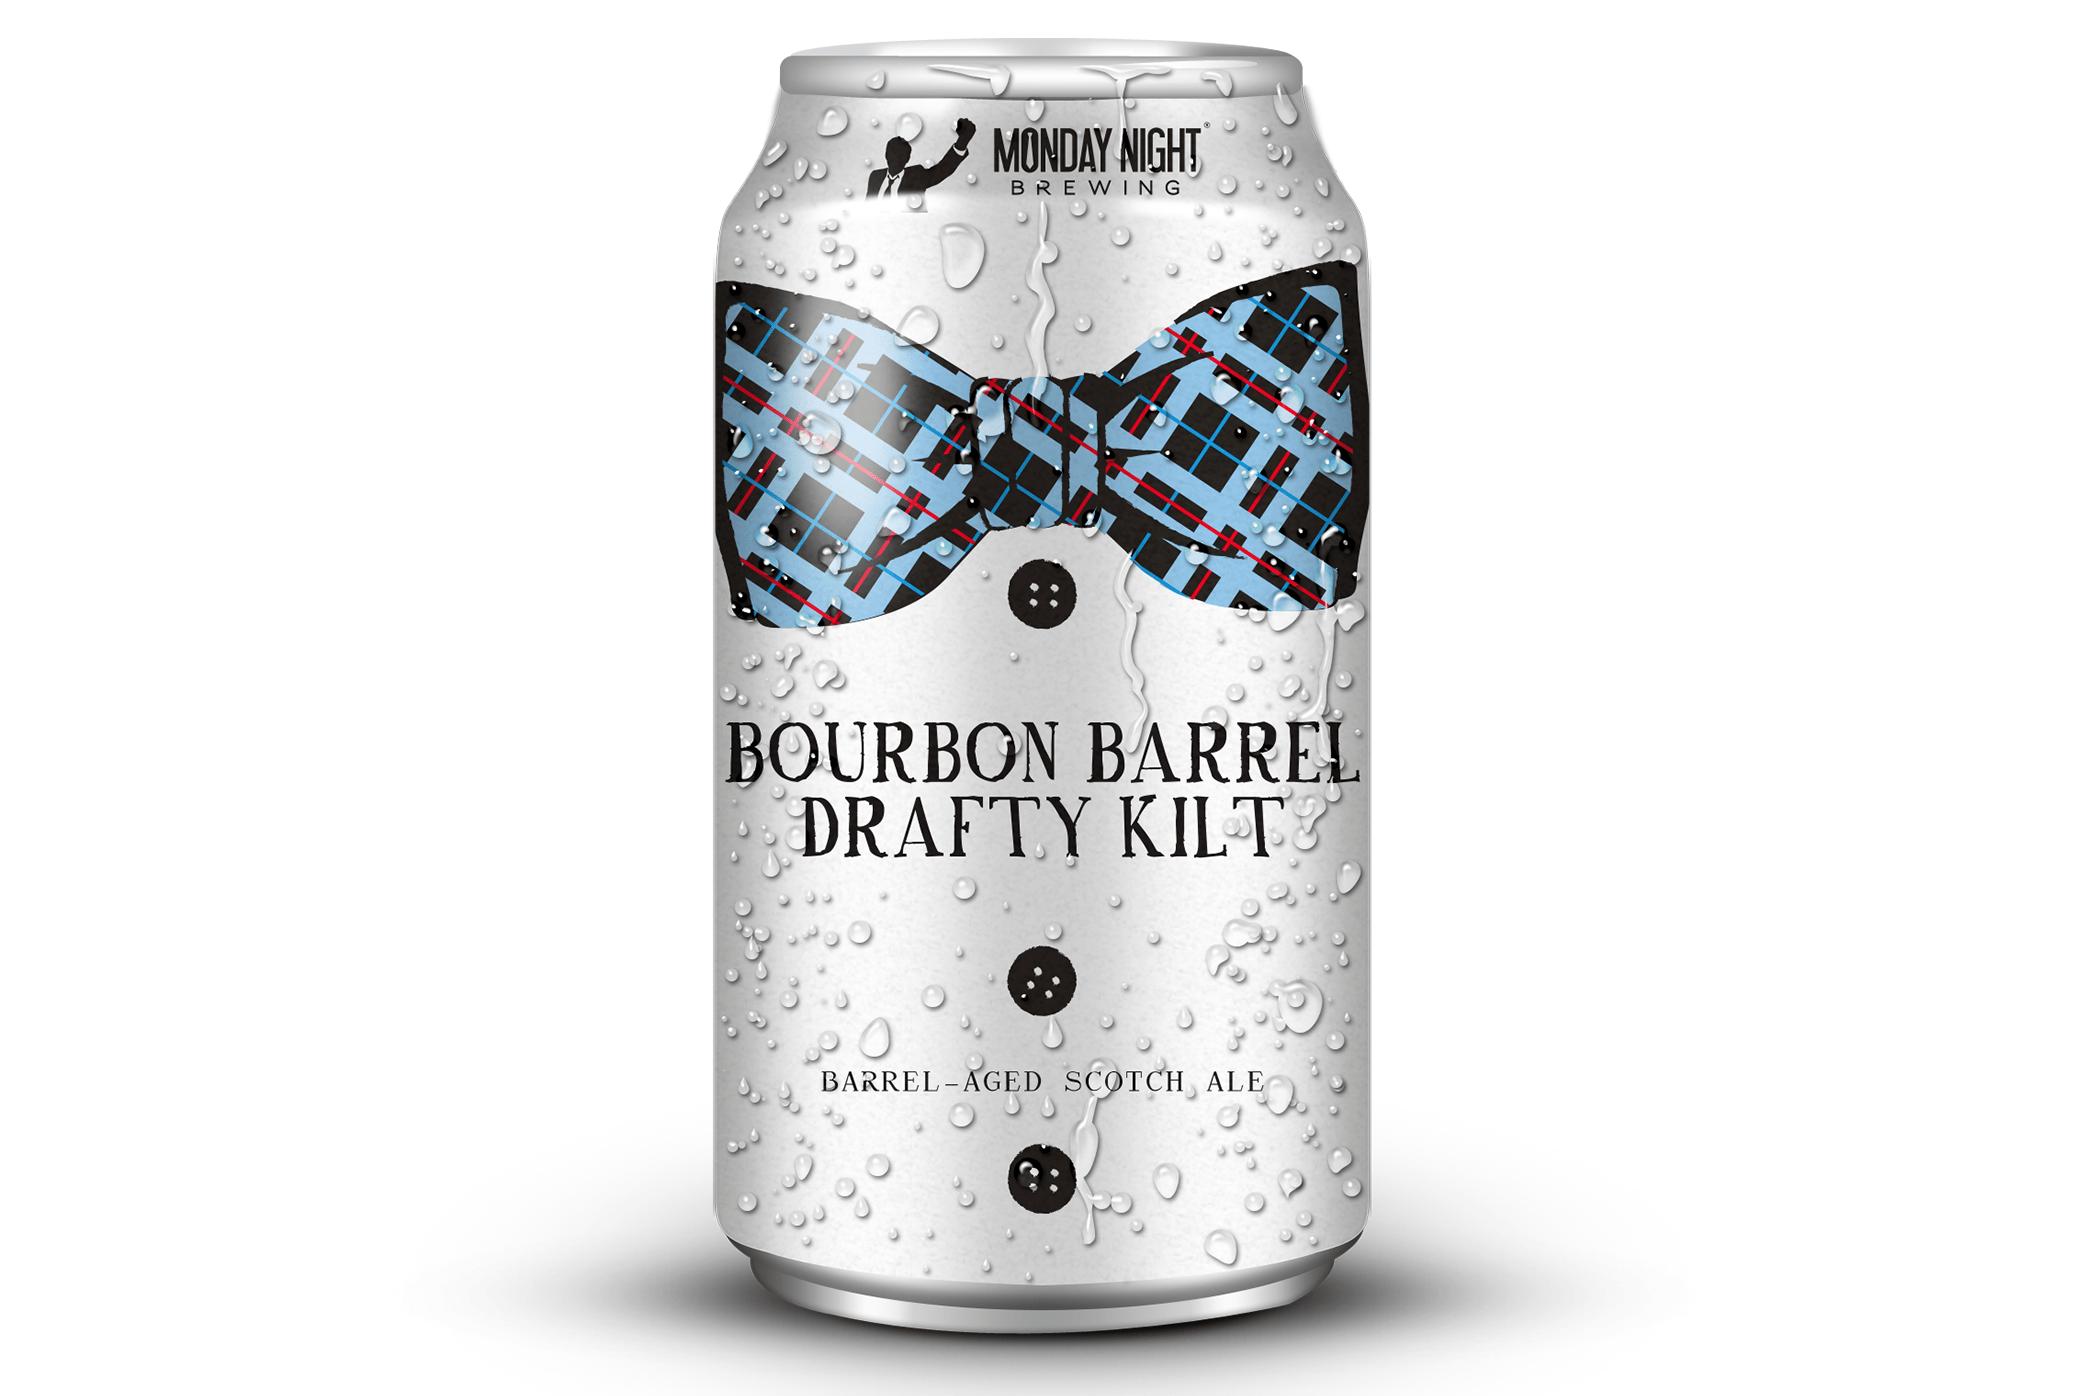 Monday Night Bourbon Barrel Drafty Kilt cans return